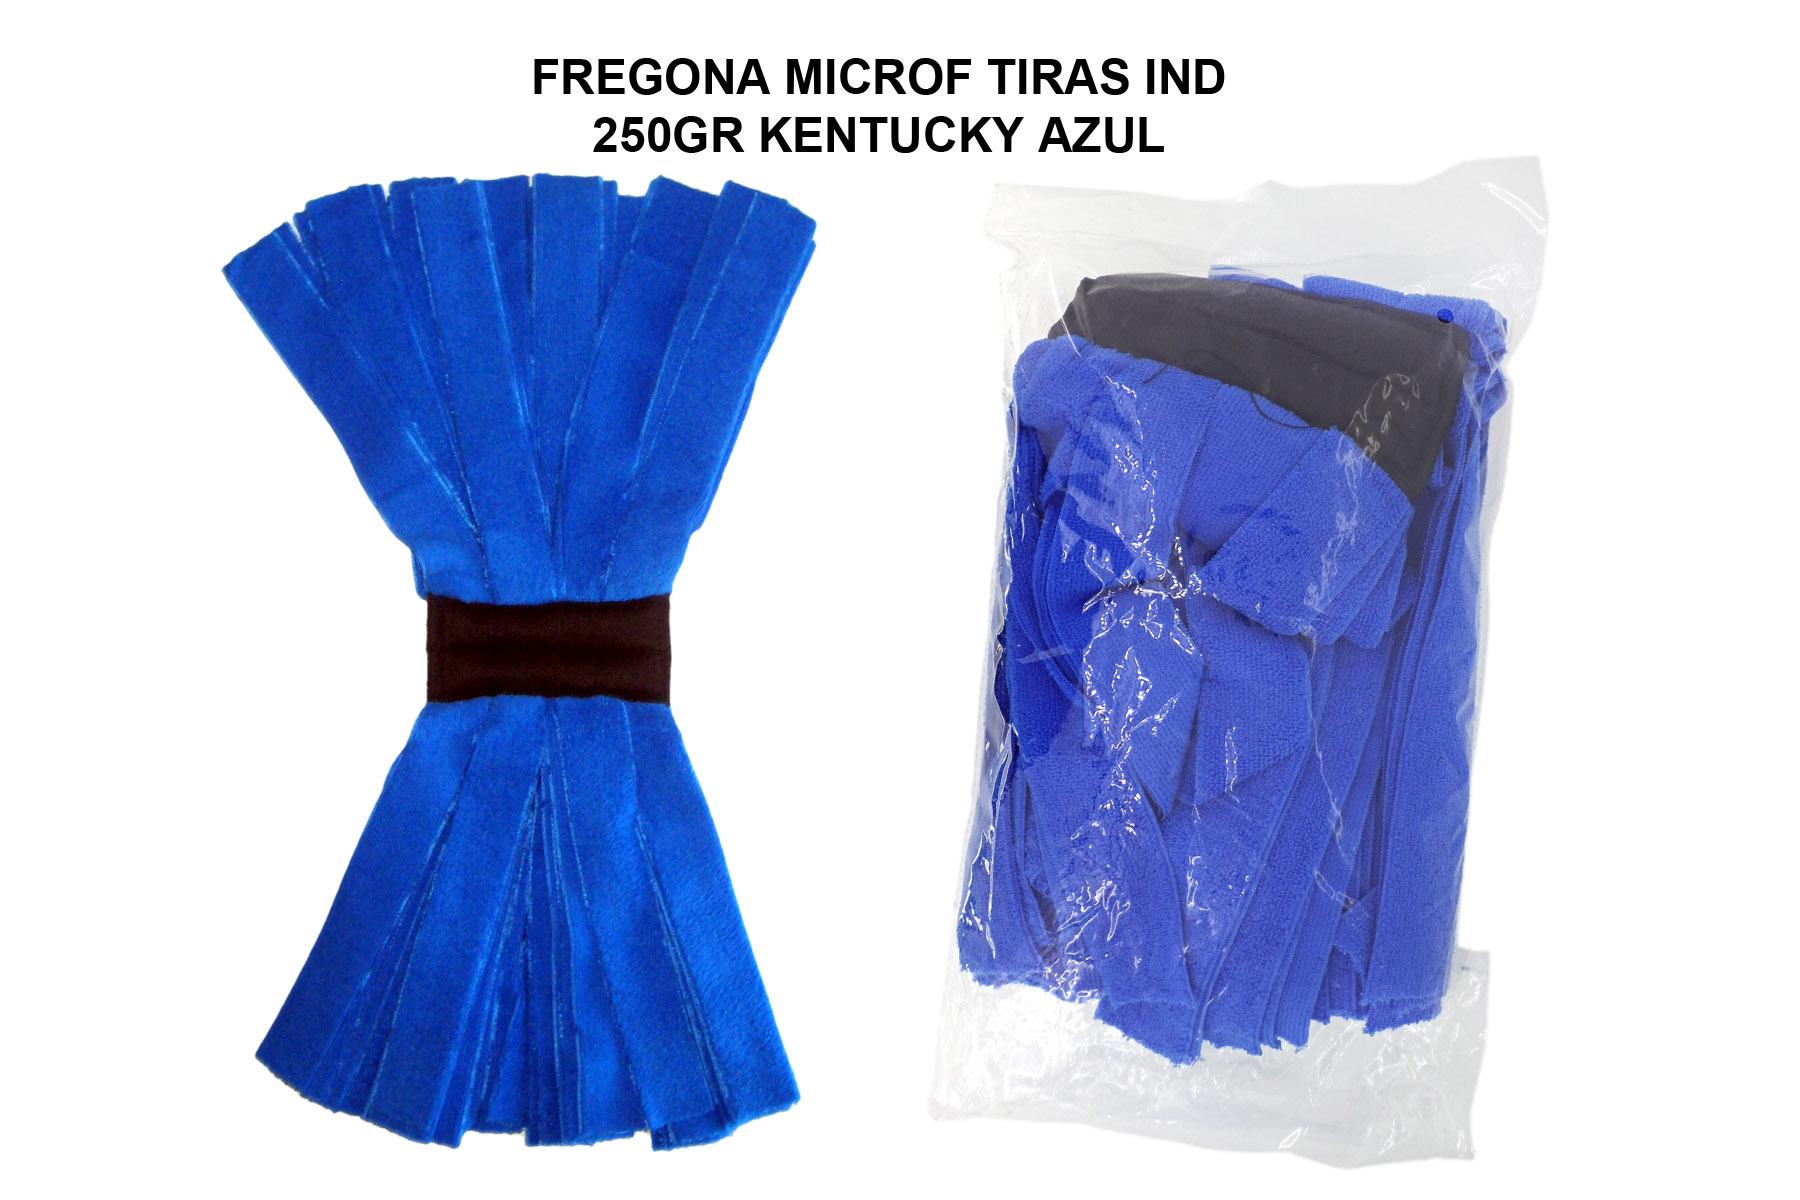 FREGONA MICROF. TIRAS IND 250GR KENTUCKY AZUL